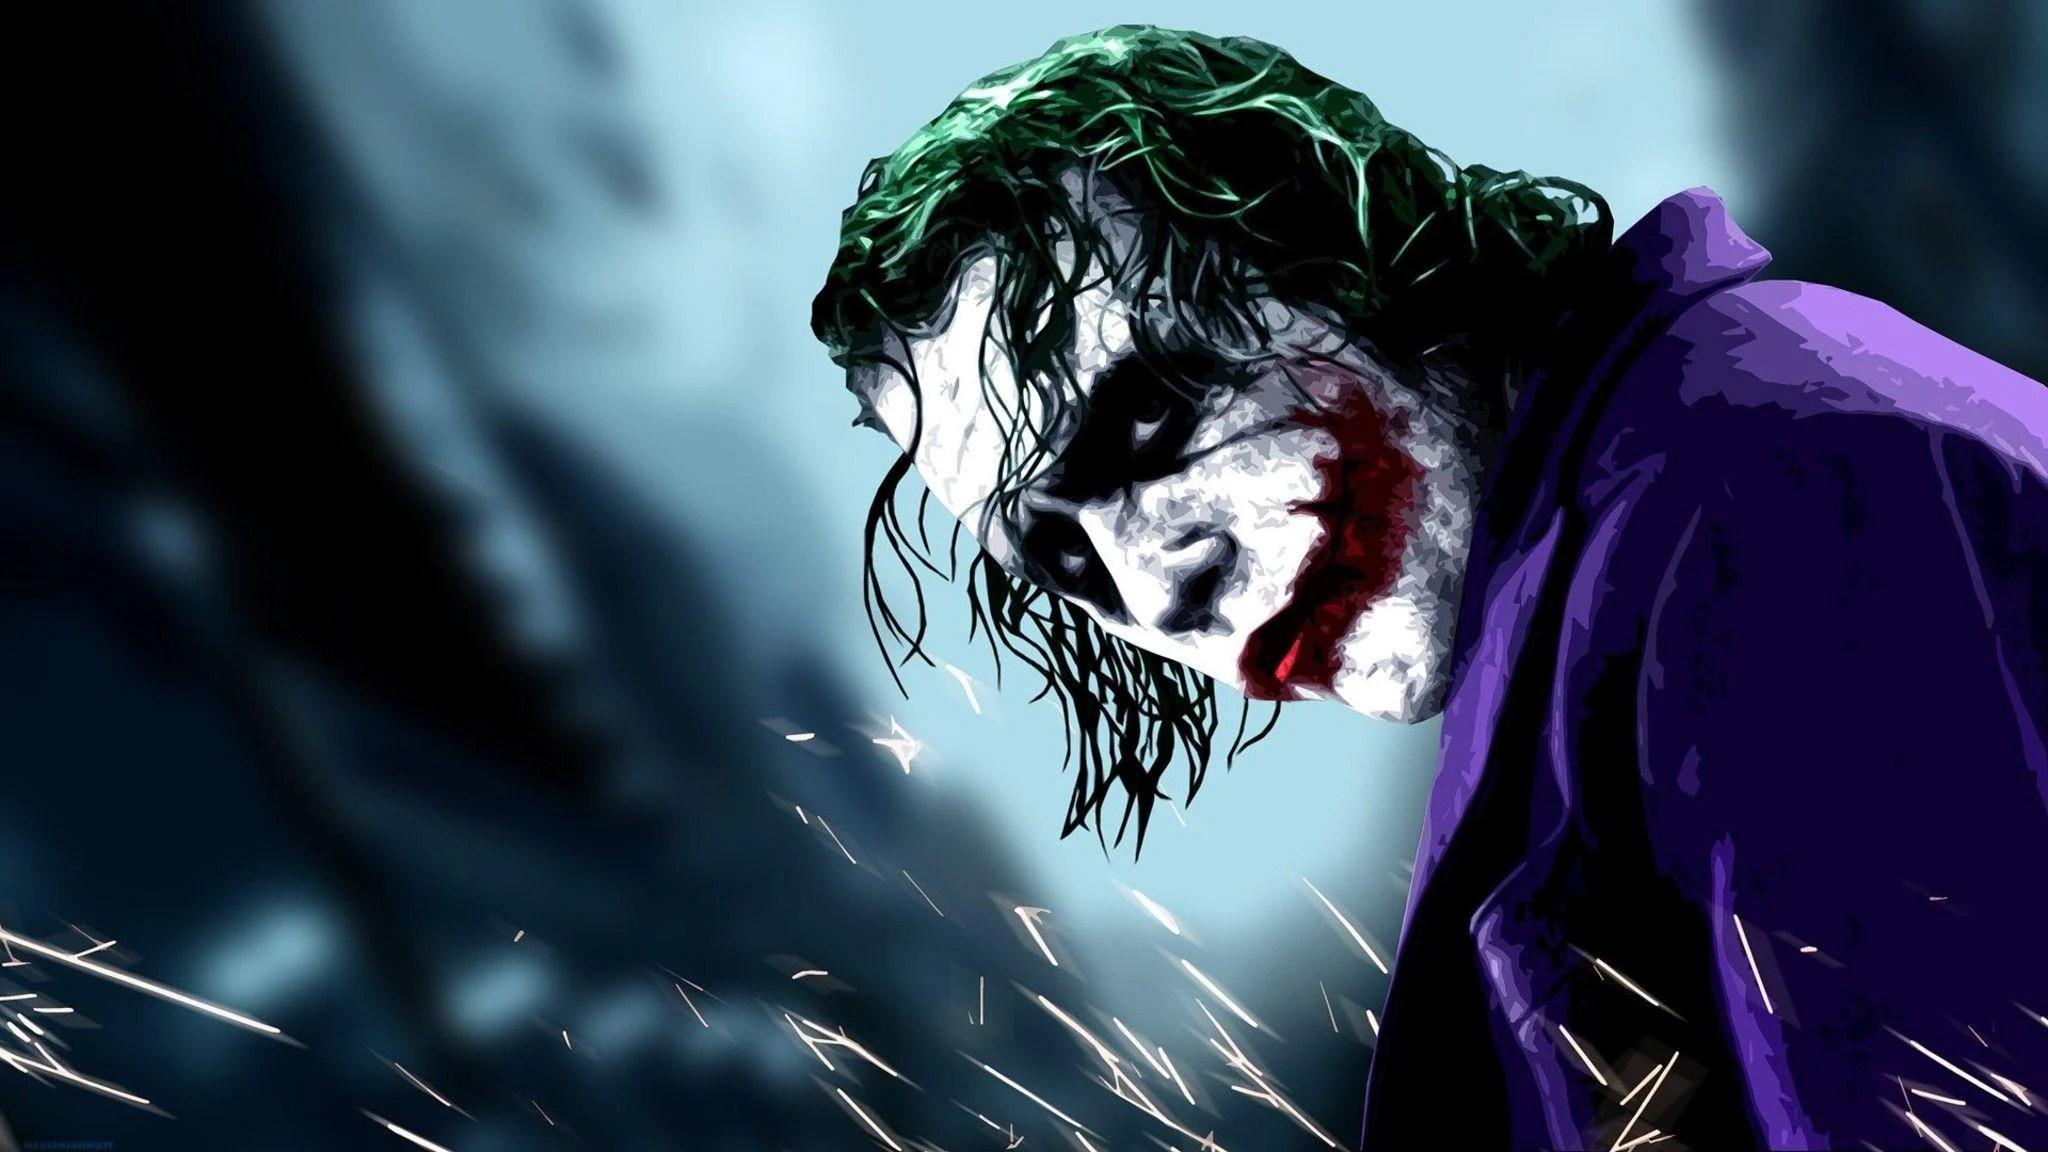 Joker 4k Ultra Hd Wallpapers Top Free Joker 4k Ultra Hd Backgrounds Wallpaperaccess